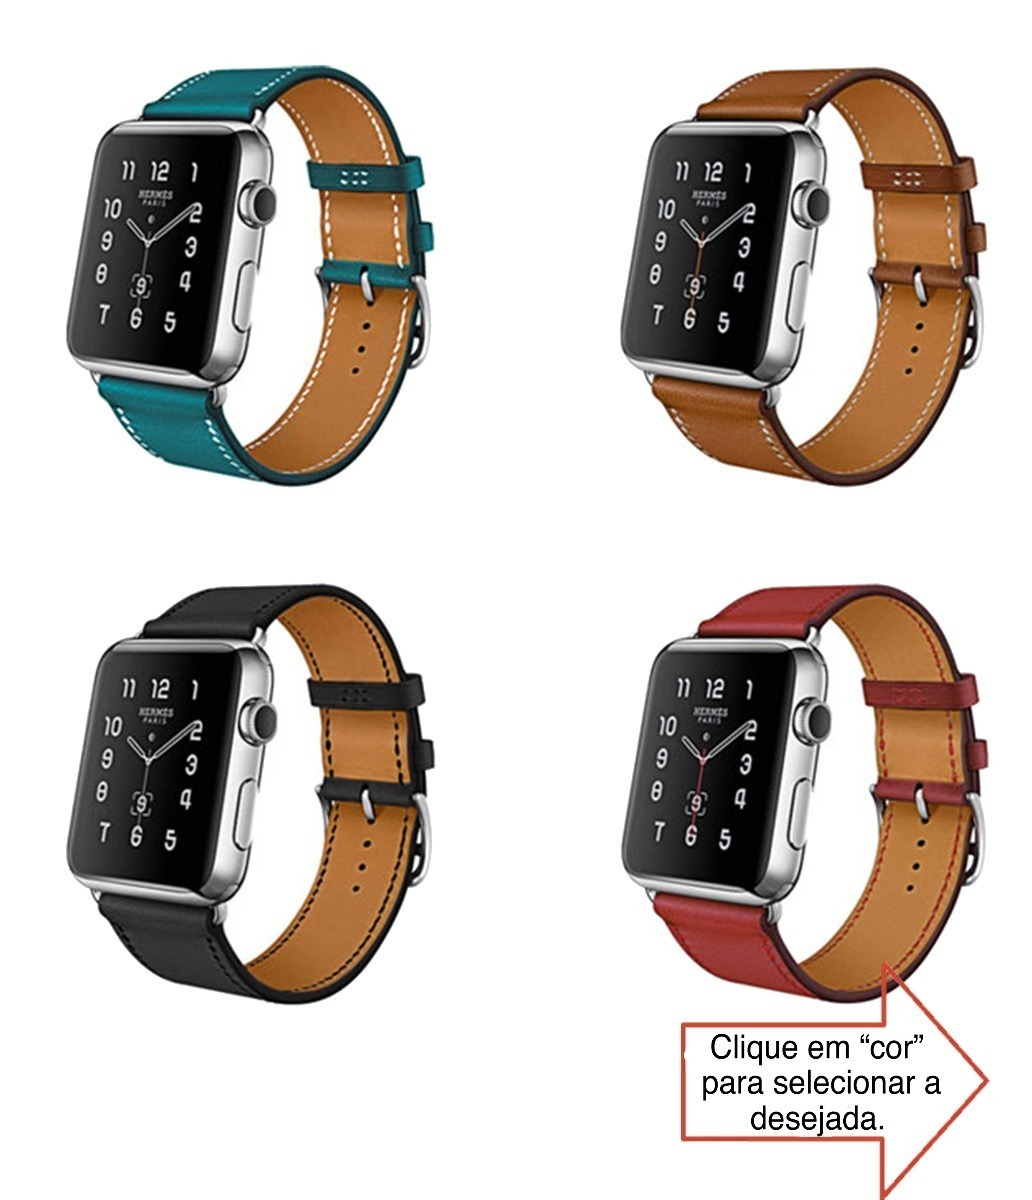 f83906e585b pulseira hermes single tour couro apple watch 42mm 38mm 44mm. Carregando  zoom.